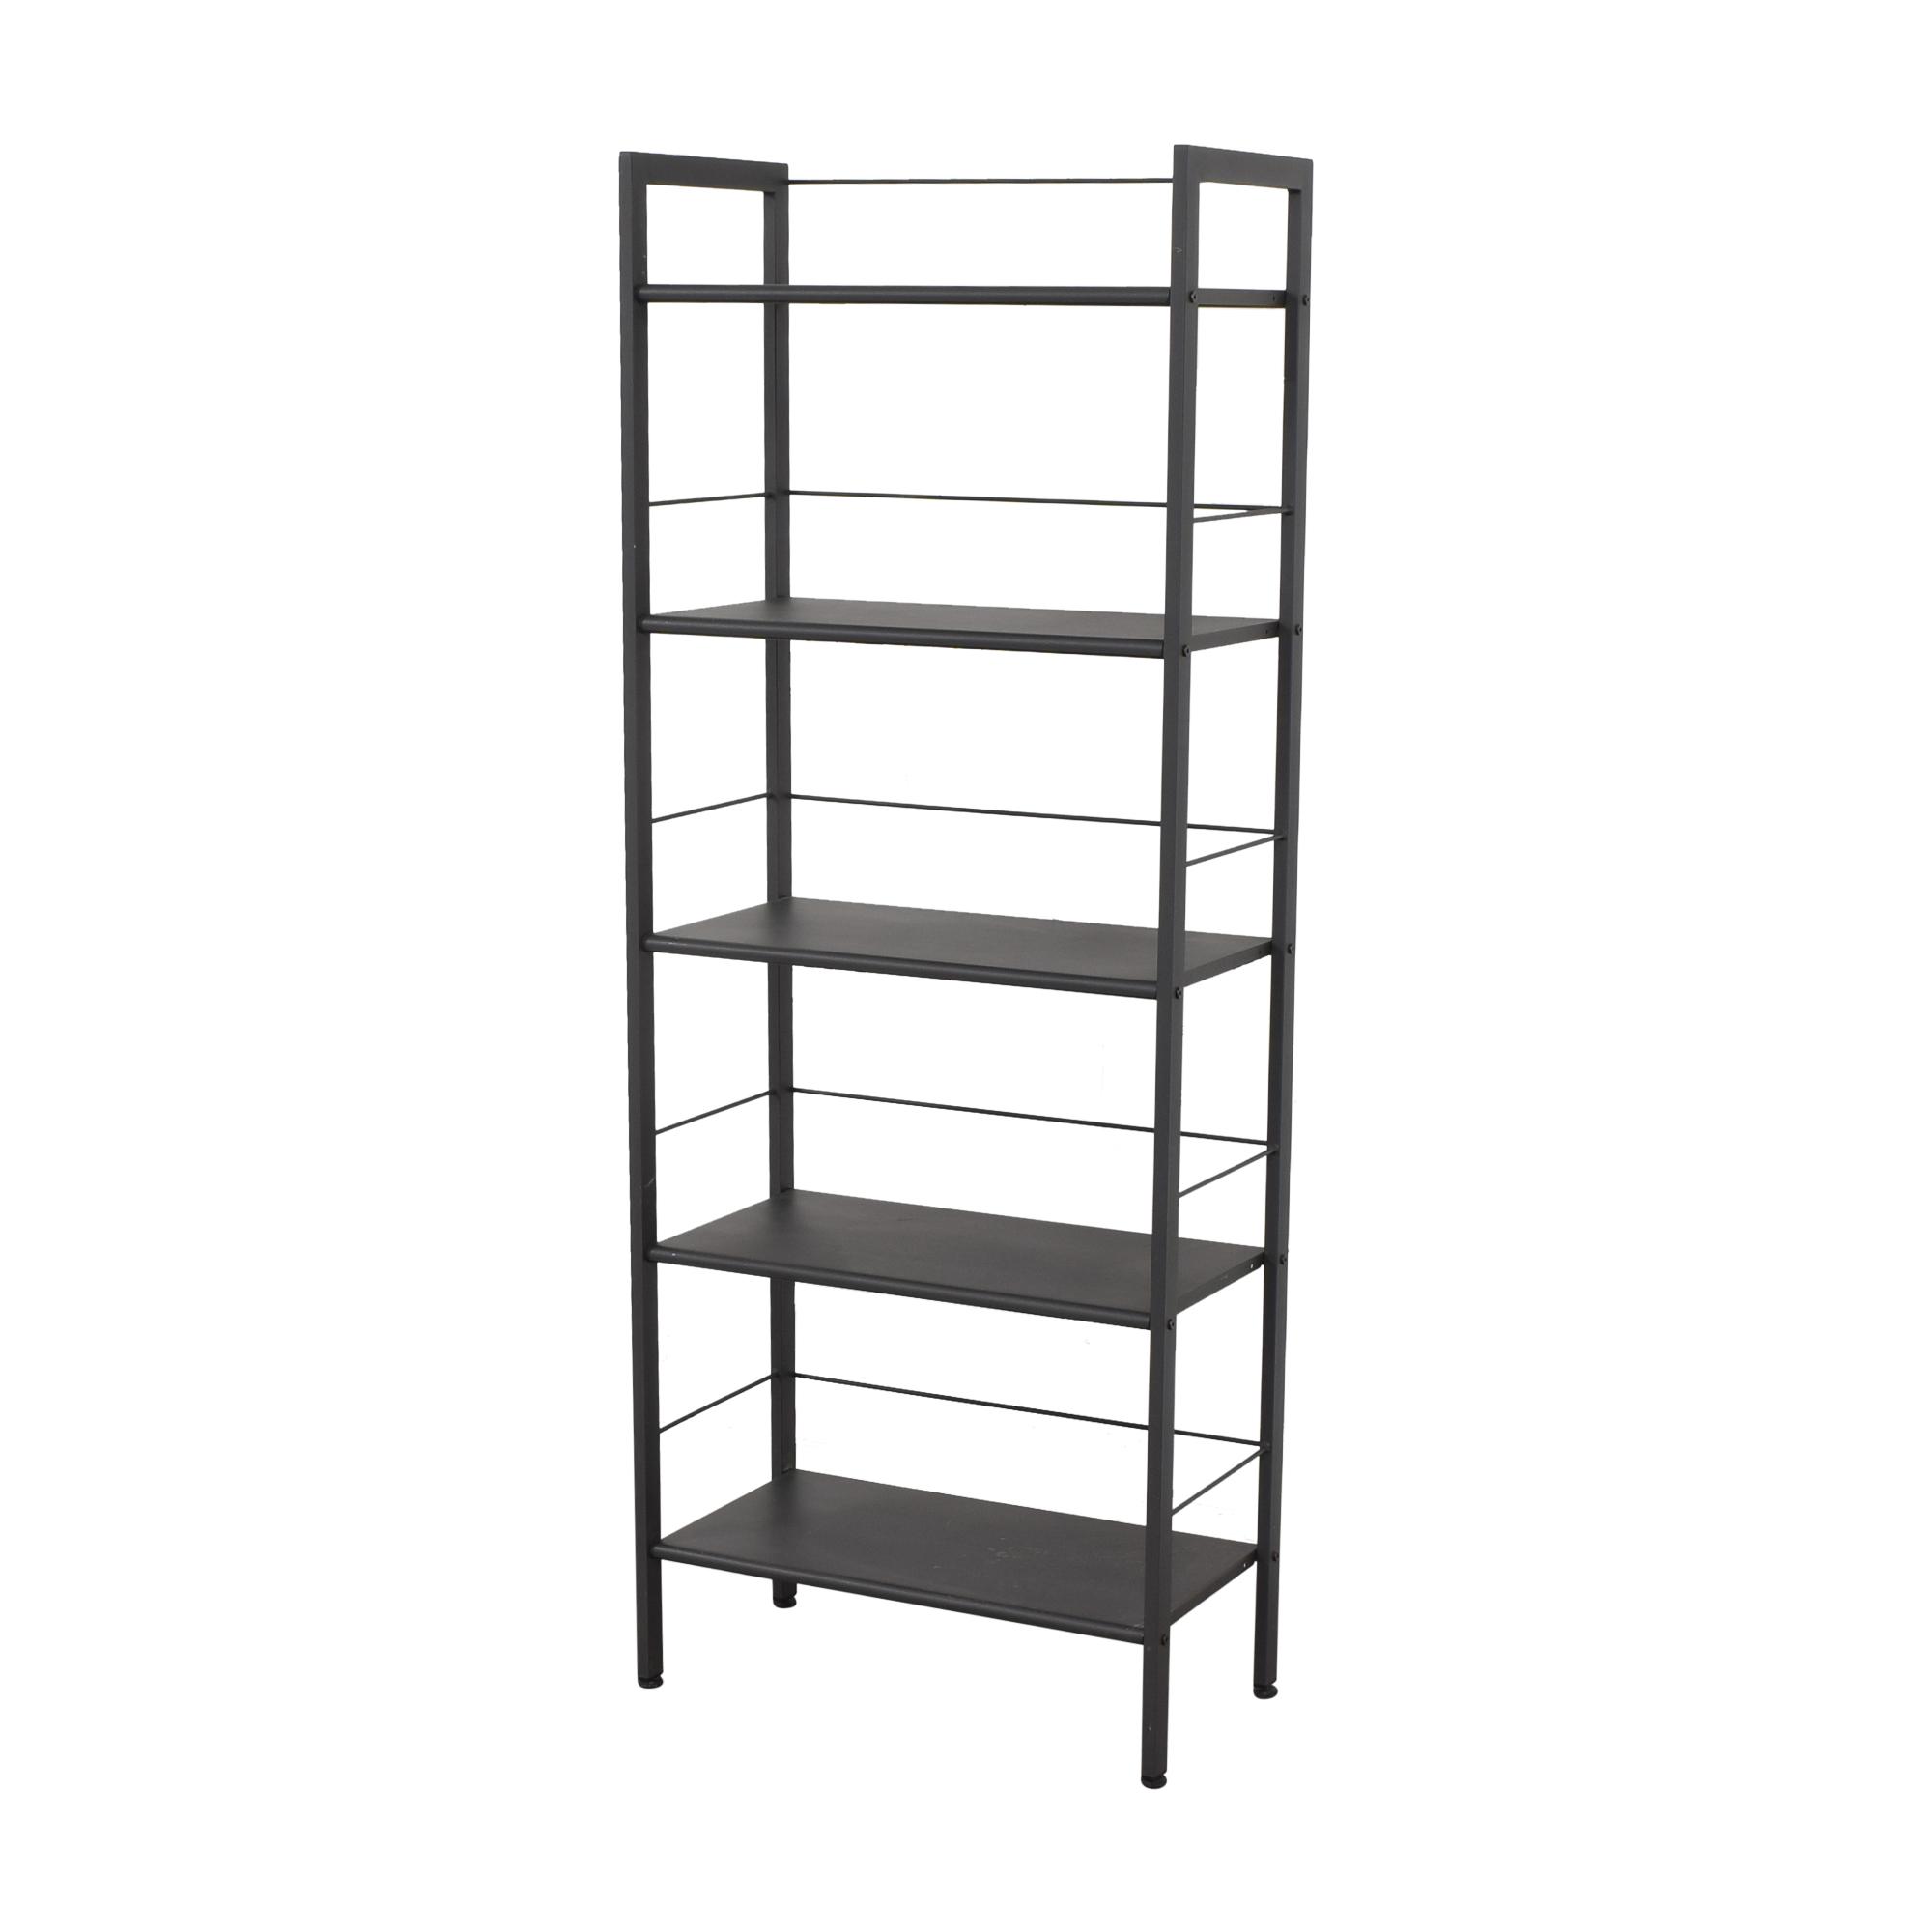 buy Crate & Barrel Pilsen Graphite Bookcase Crate & Barrel Storage